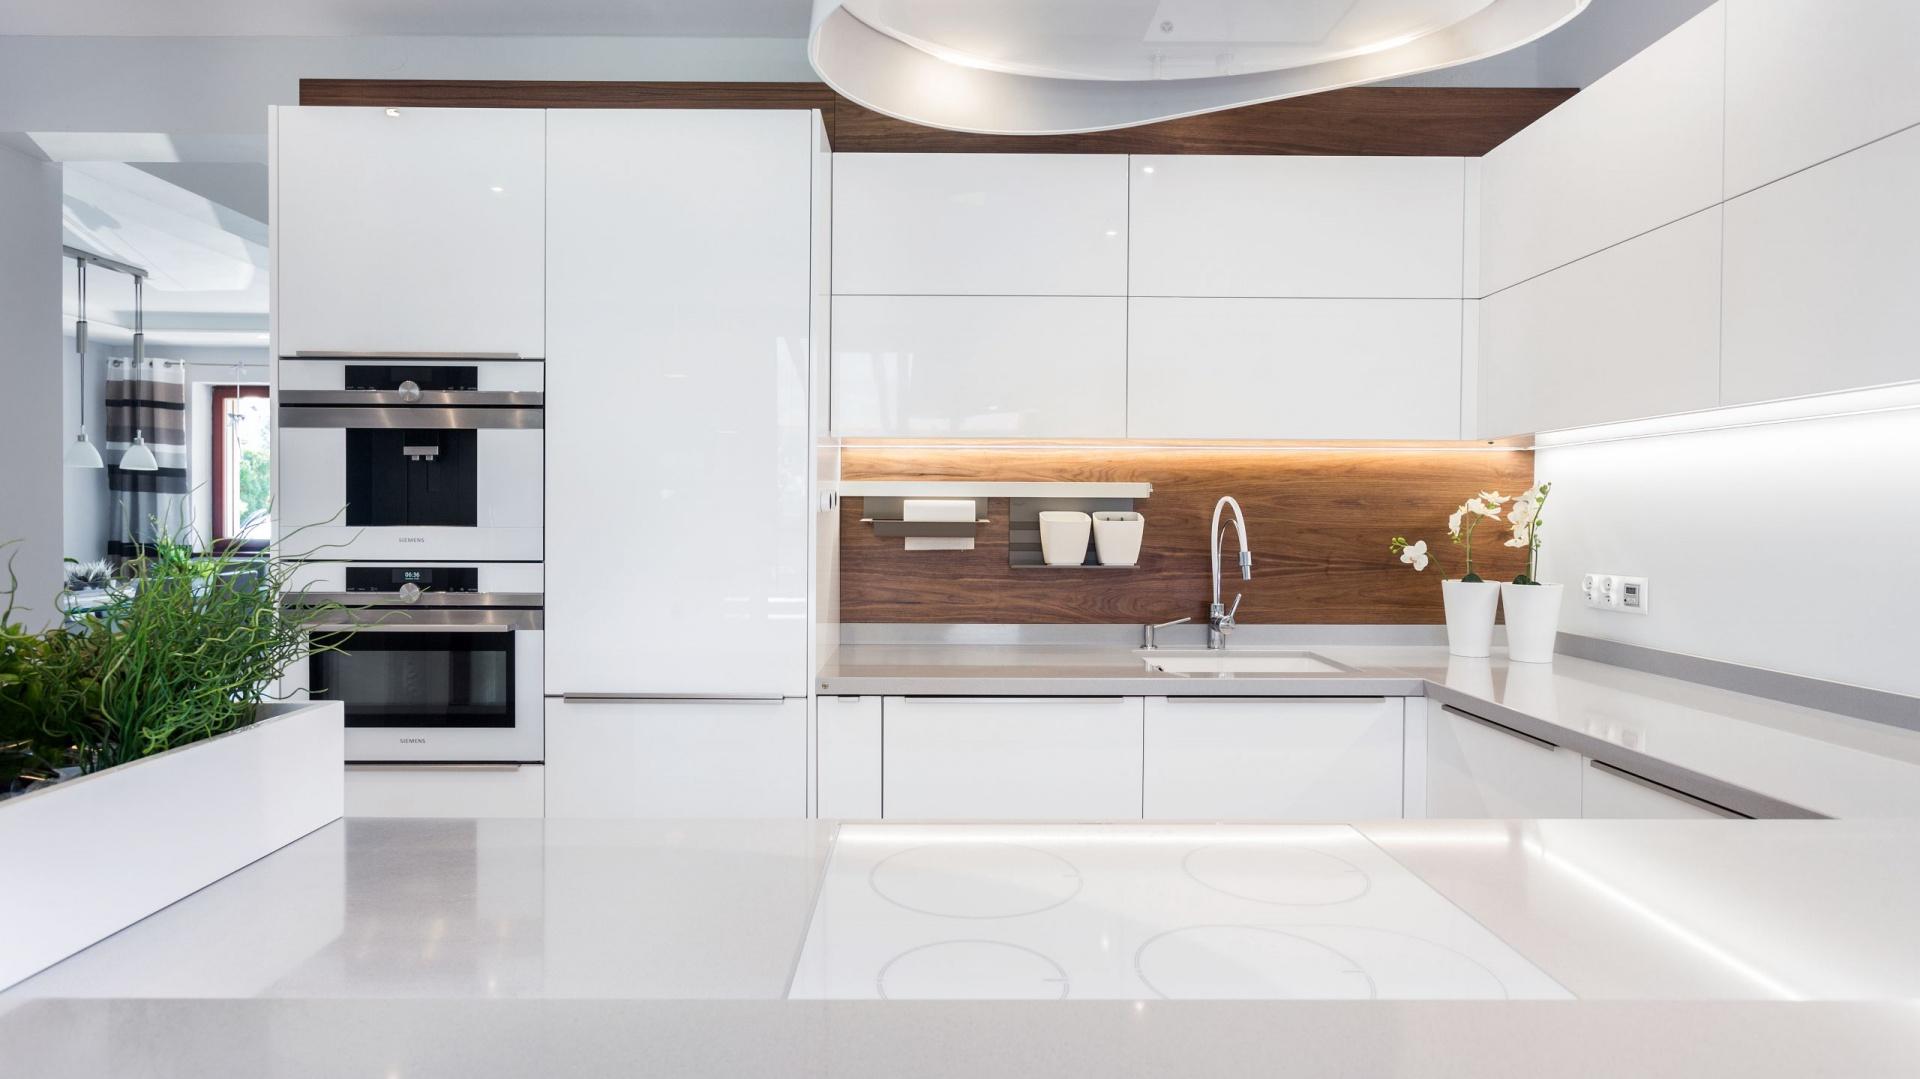 minimalizm w kuchni meble minimalizm w kuchni